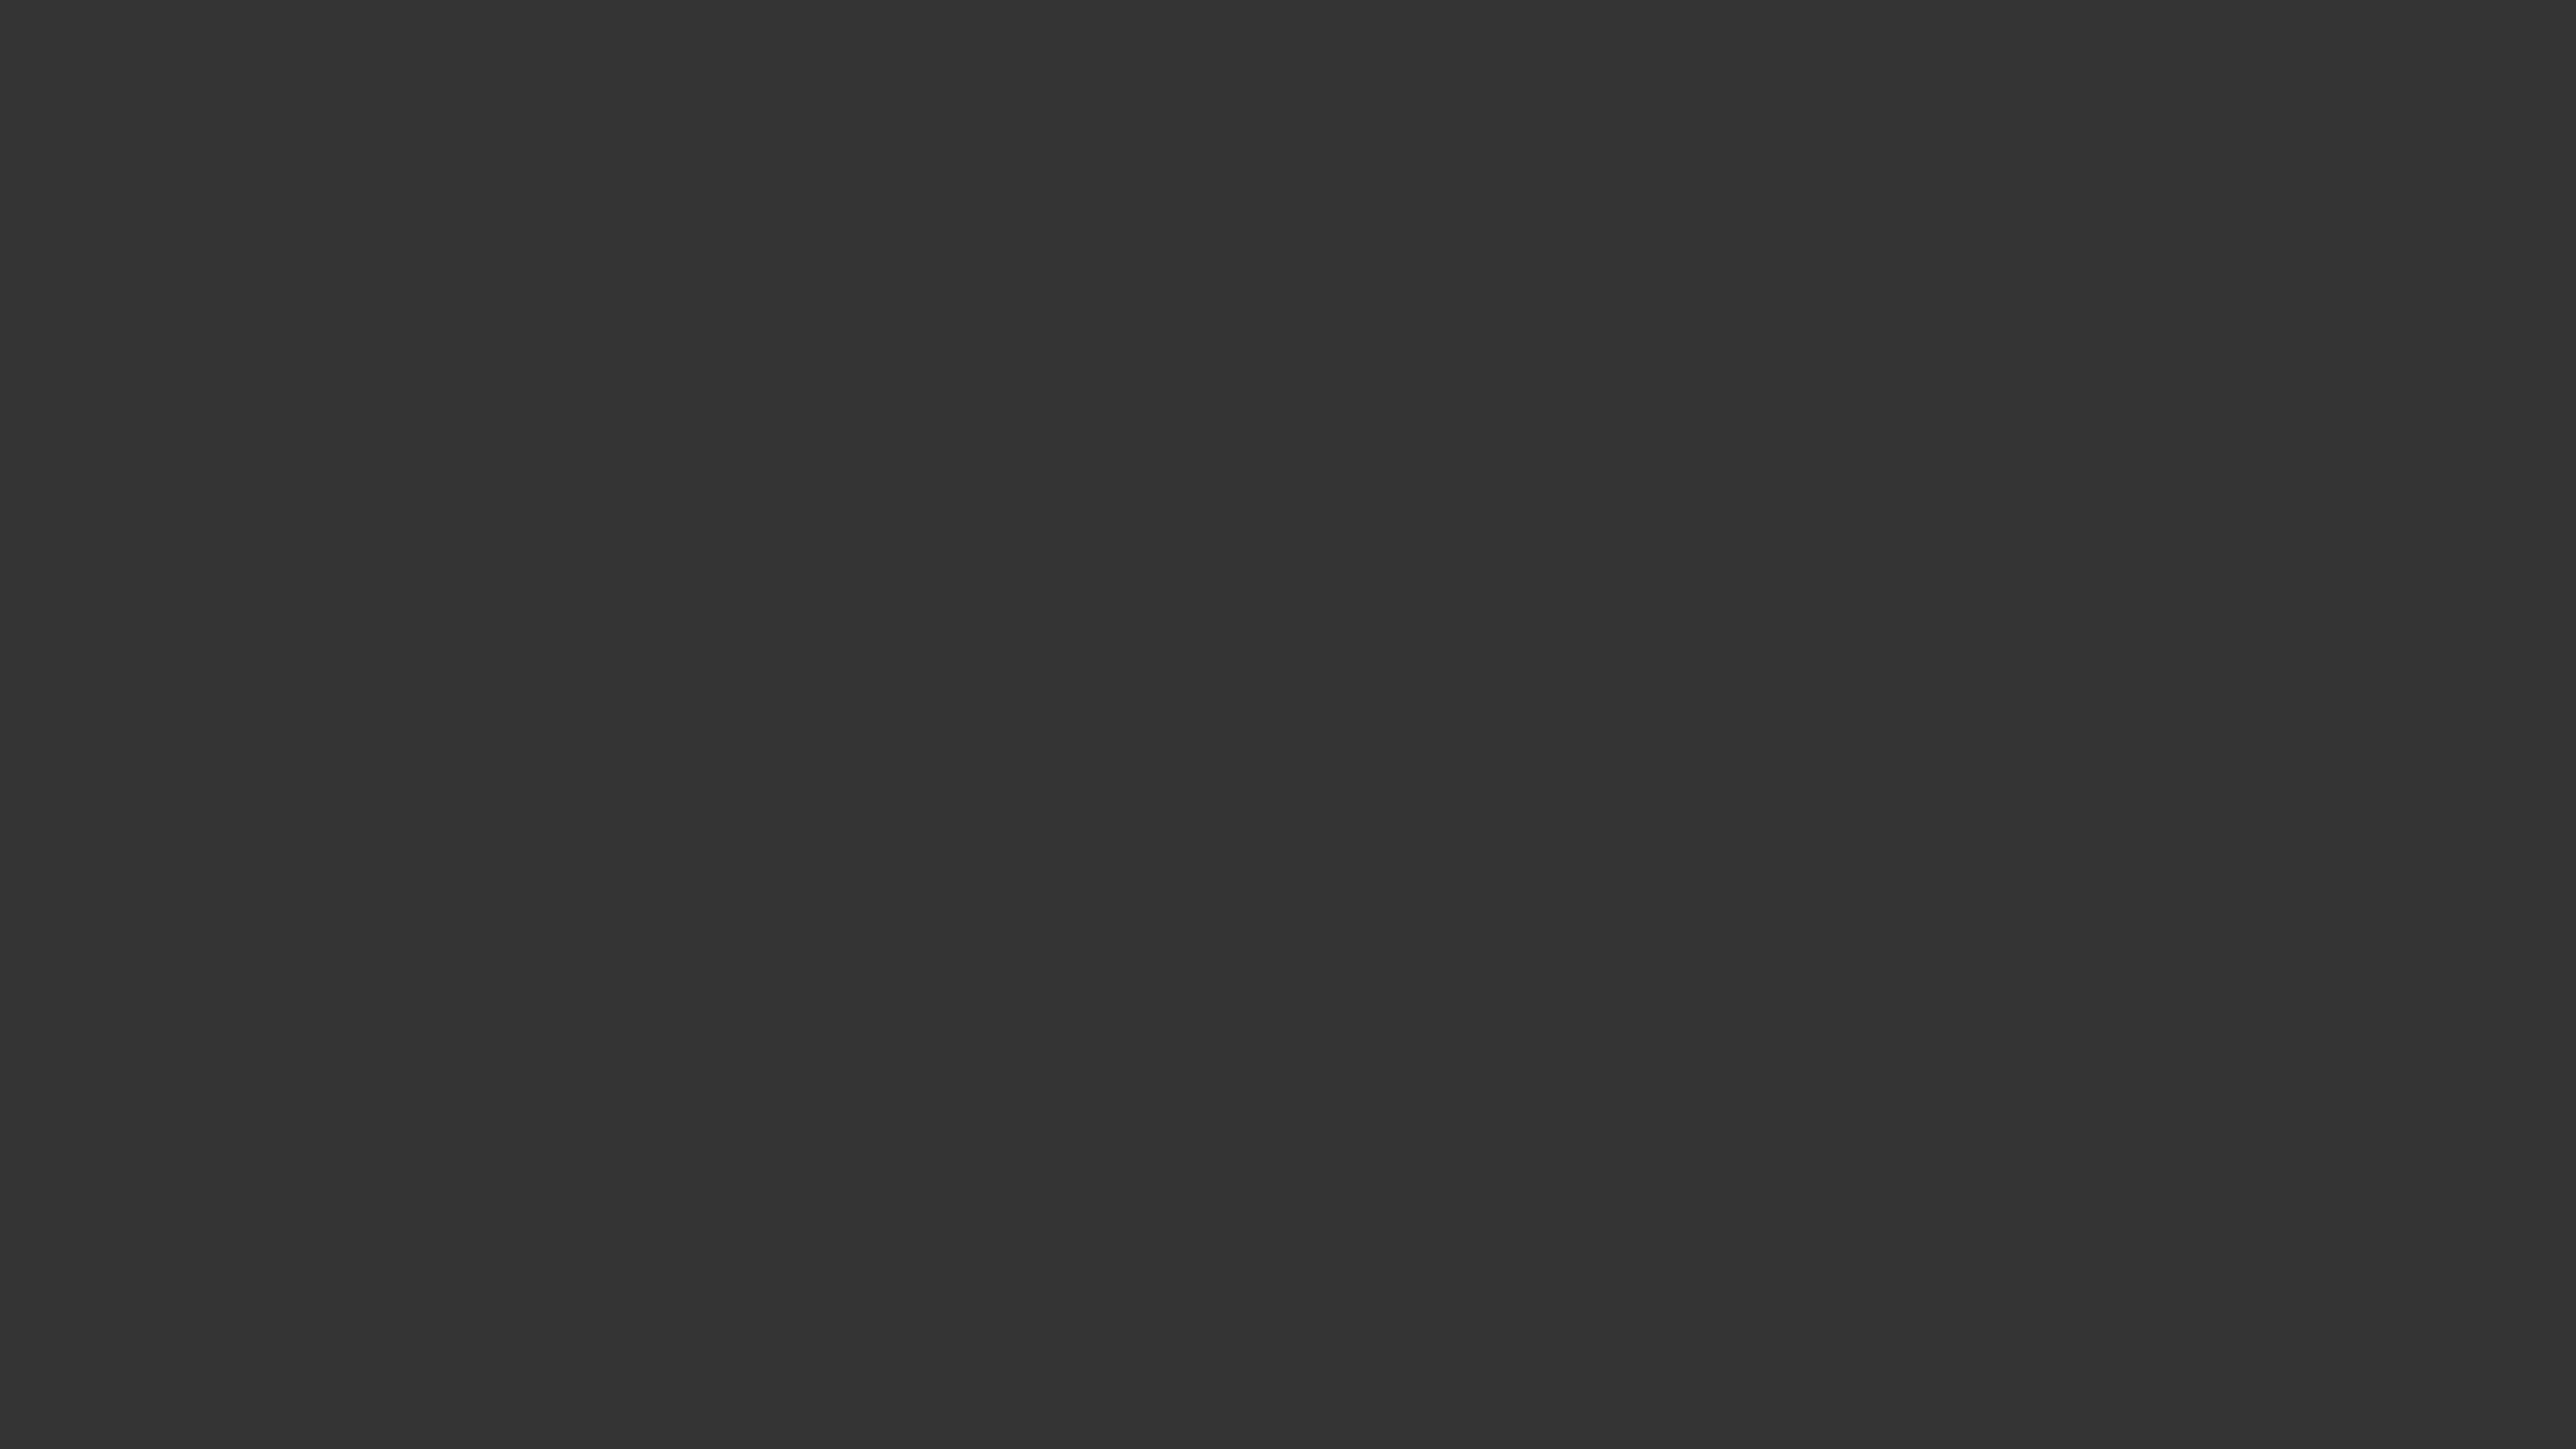 3840x2160 Jet Solid Color Background